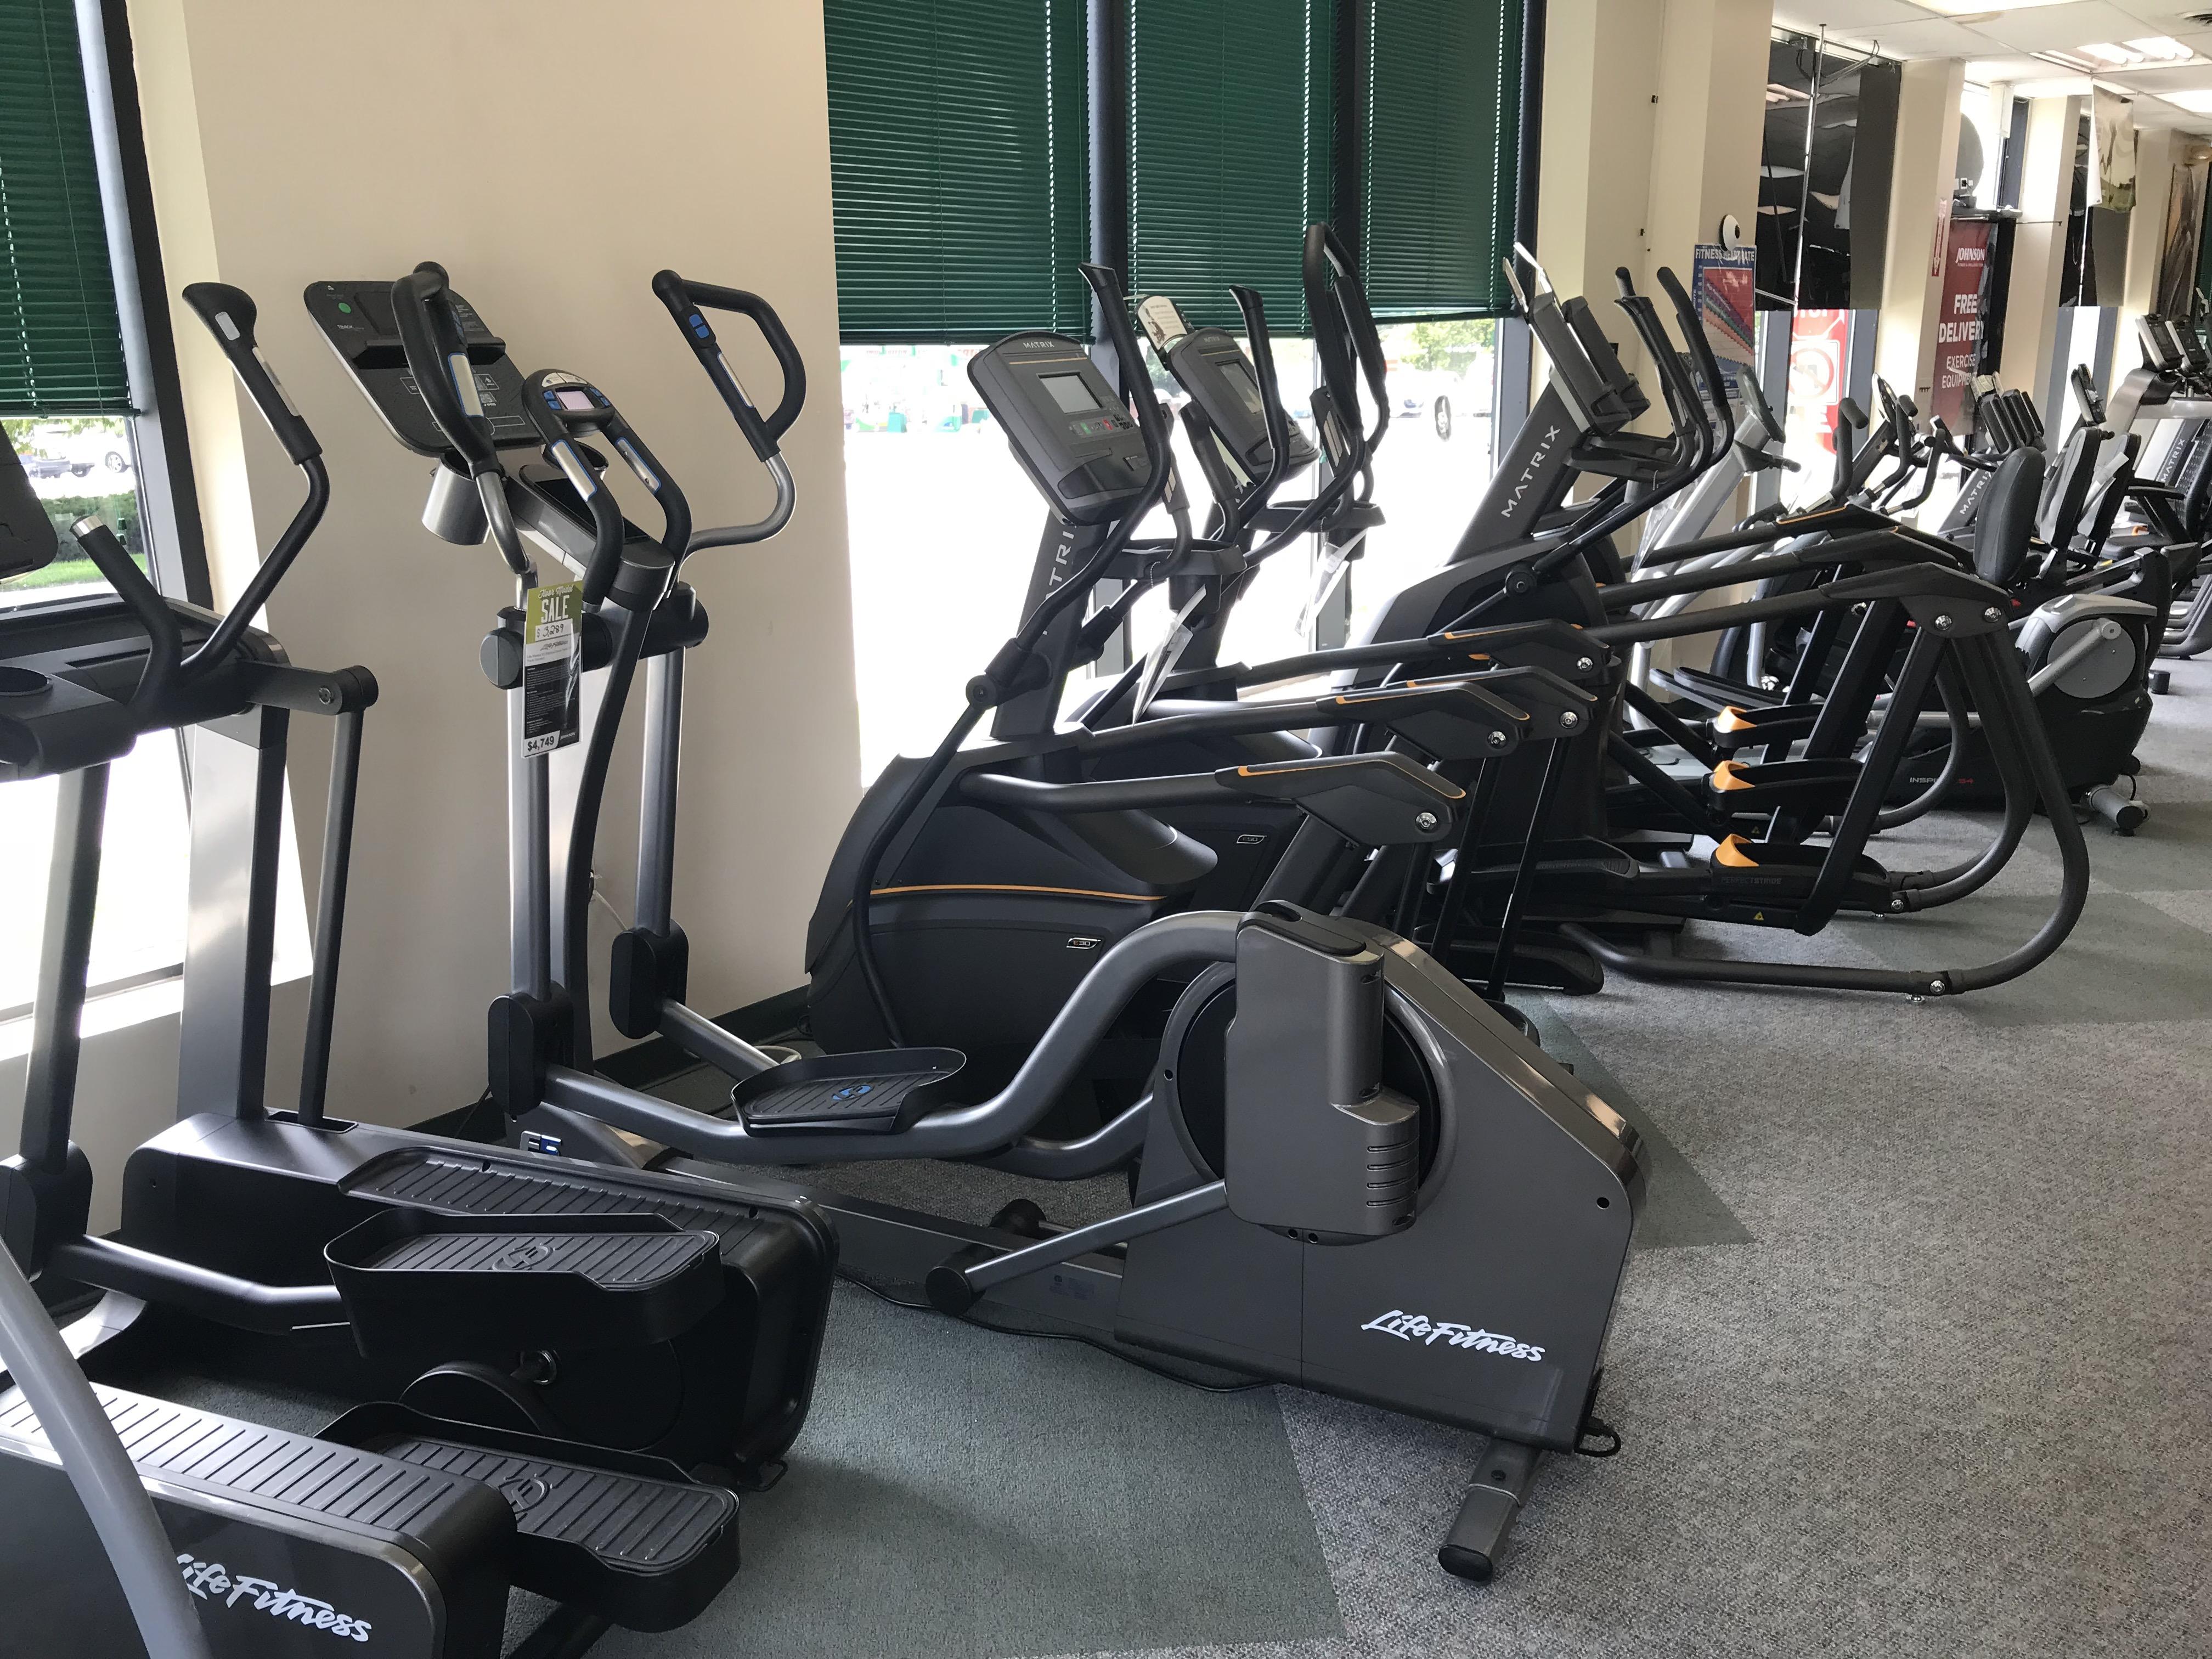 Leisure Fitness - Cockeysville, MD